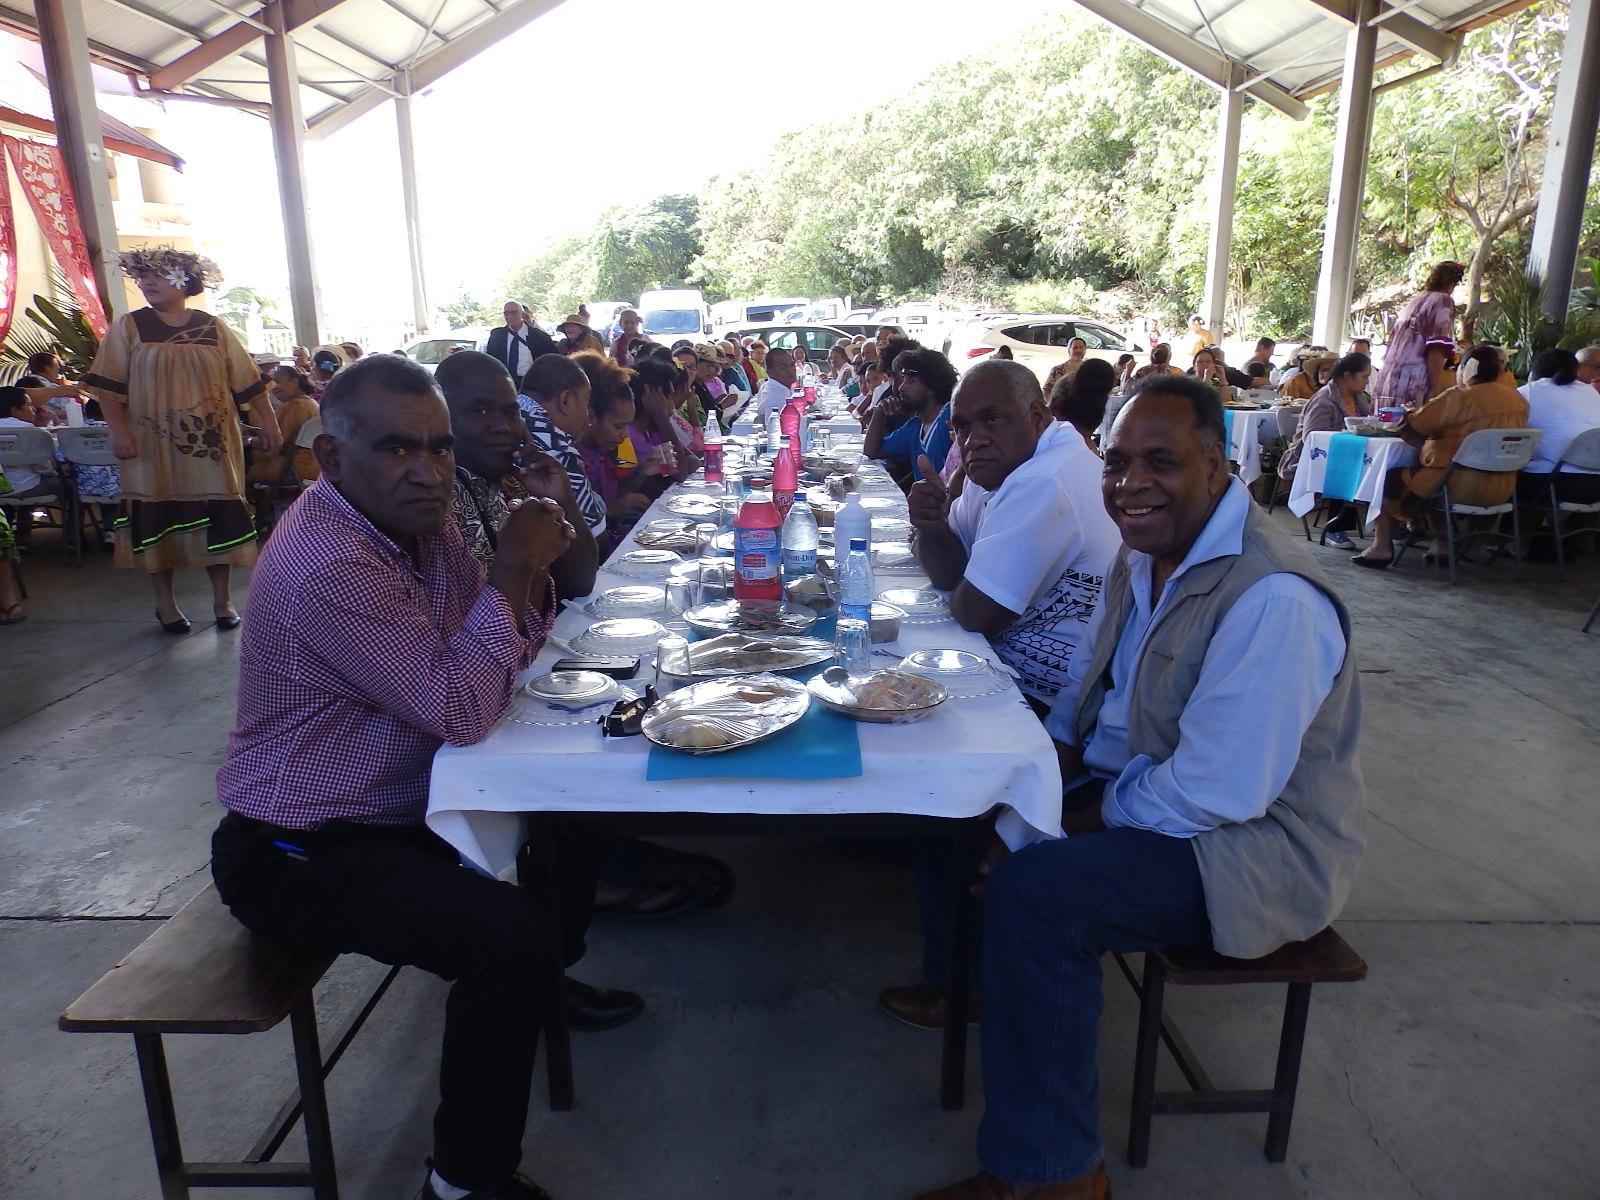 Repas fraternel : avec les membres du Conseil Exécutif de l'EPKNC